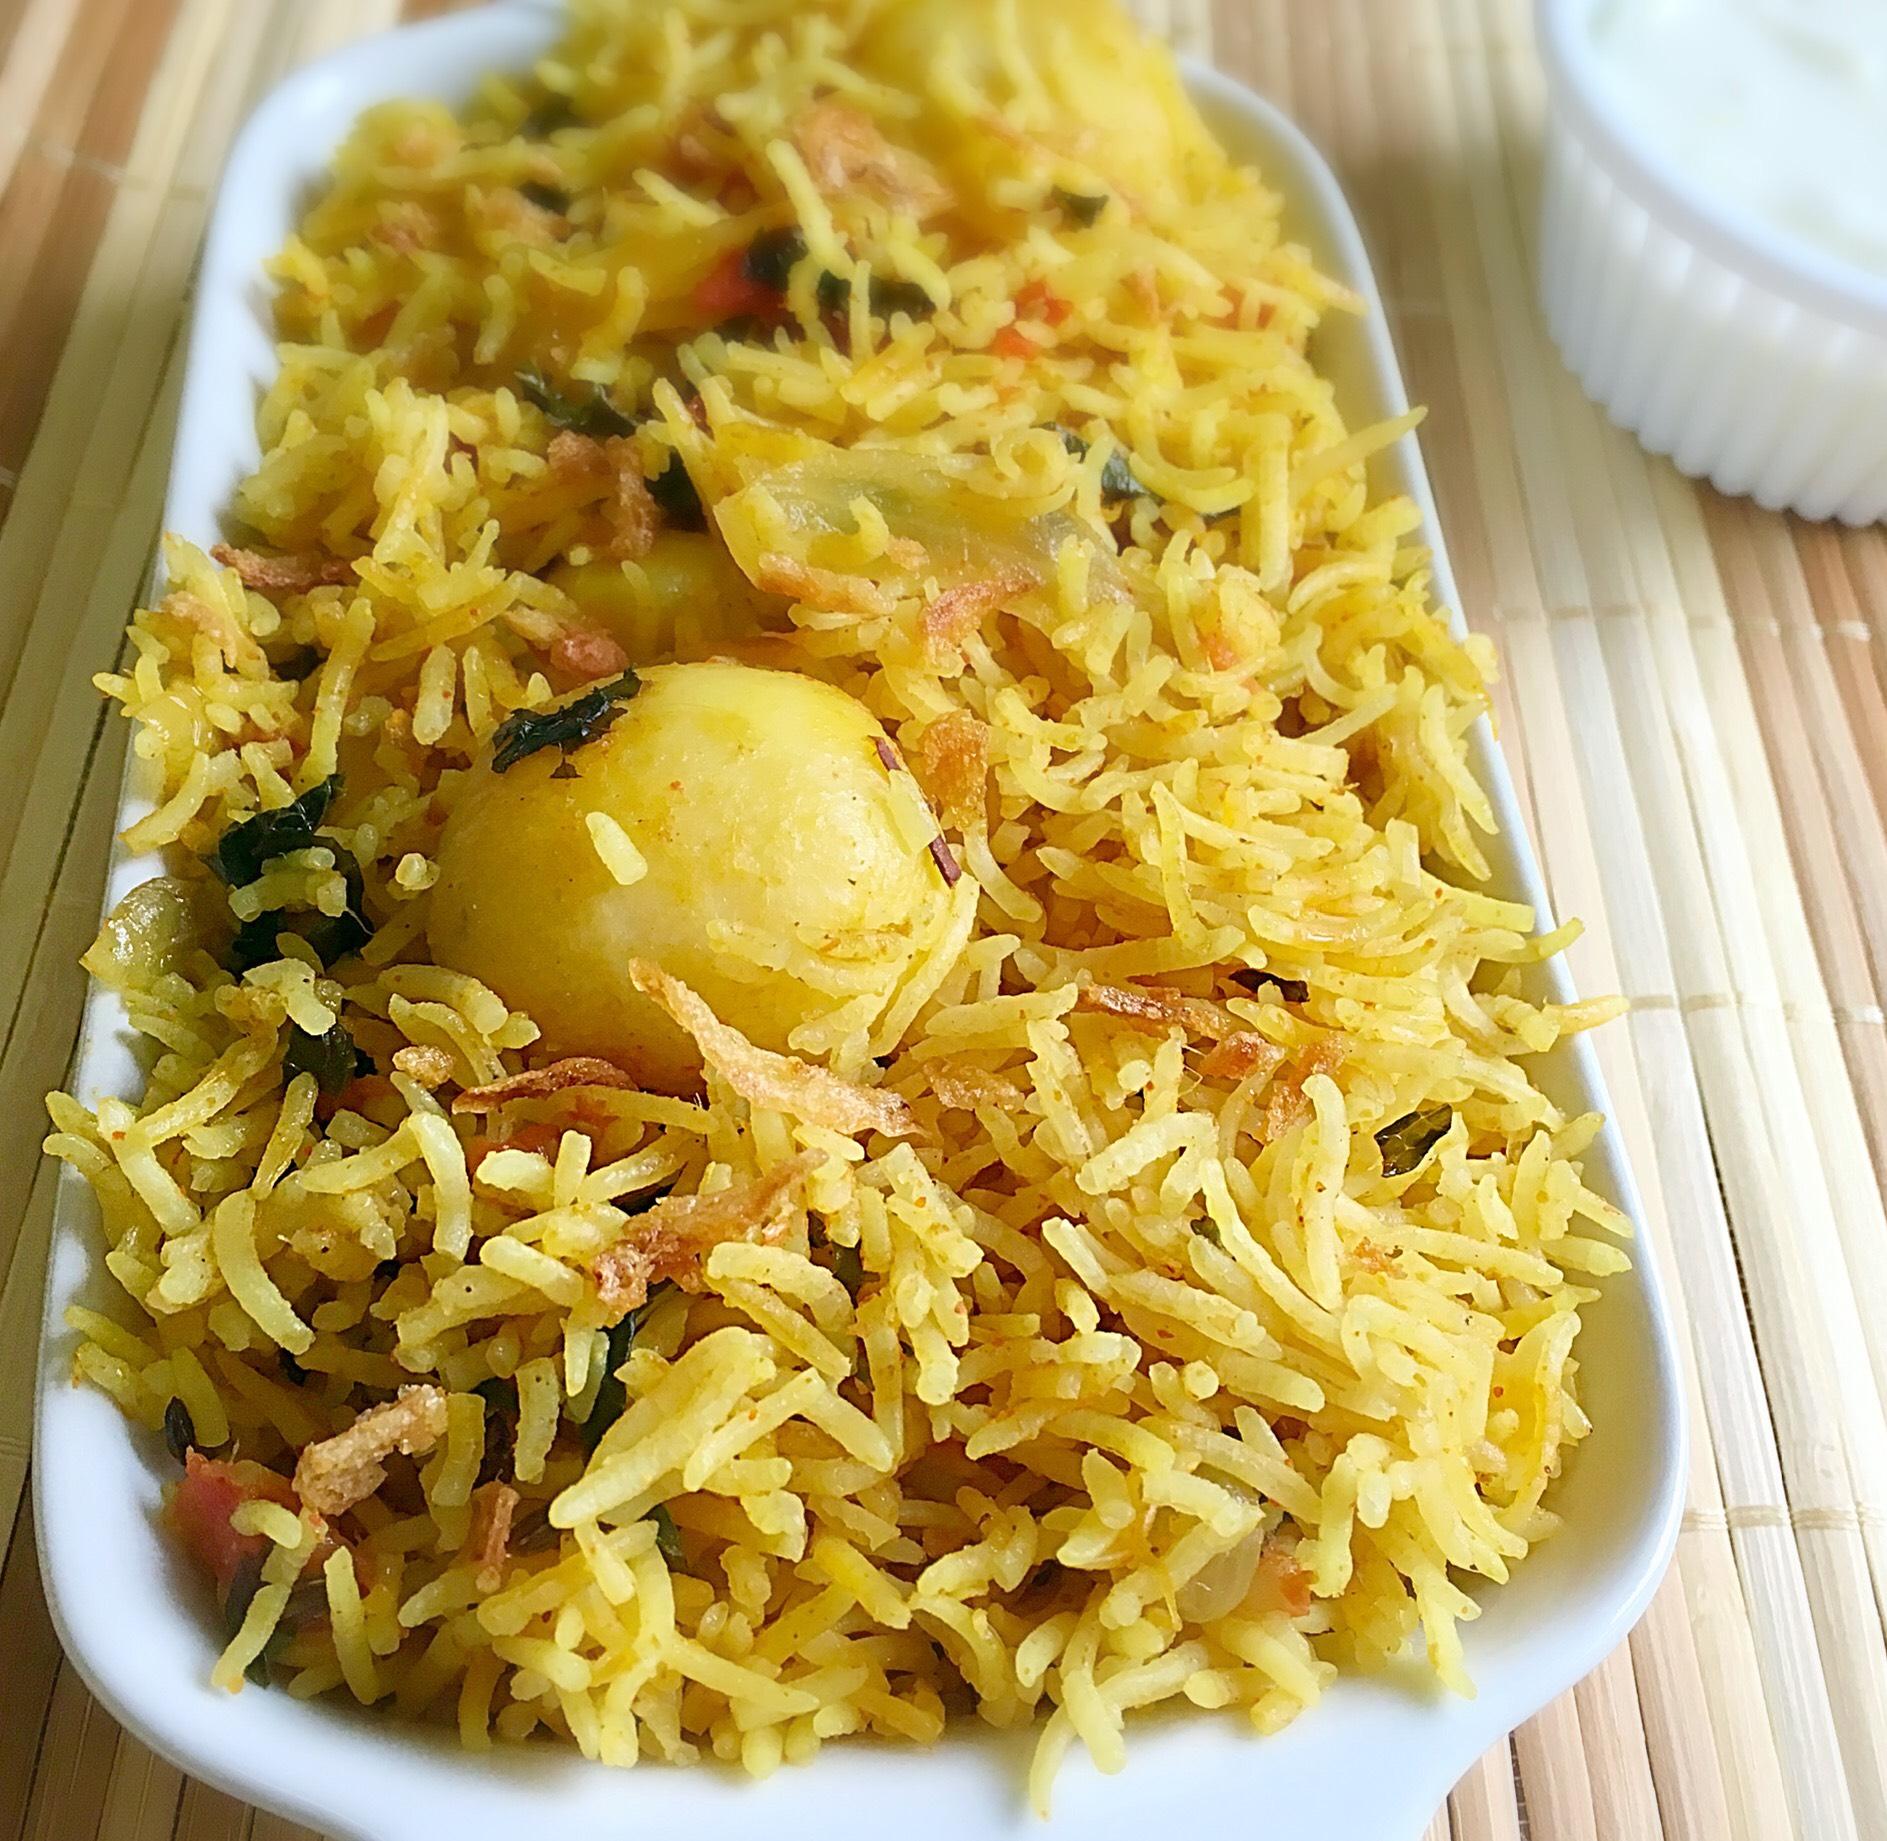 bonda,vadai,masala vadai,medhu vadai,hotel,saravana bhavan,paruppu vadai,kara vadai,ulundu vadai,adai,chutney,oil,frying,besan,kadalai mavu.idli,sambar,dosa,potato bajji,bajji,south indian snacks,evening snacks,snacks,Urulaikizhangu bajji,aloo bajji,South Indian Dishes,North Indian food,vegetarian,Tamil Brahmin Recipes,Dosa varieties,sambar,Kootu,Kuzhambu,rasam,rice recipe,idly,chutney,adai,desserts,side dish for idli dosa,salads,vegetable curry,roti,parathas,Idiyappams,breakfast recipes,podi,pickles,Lunch box recipes,vegetable biryani,korma,baby potato,veg biryani,vegetable biryani,baby potato biryani